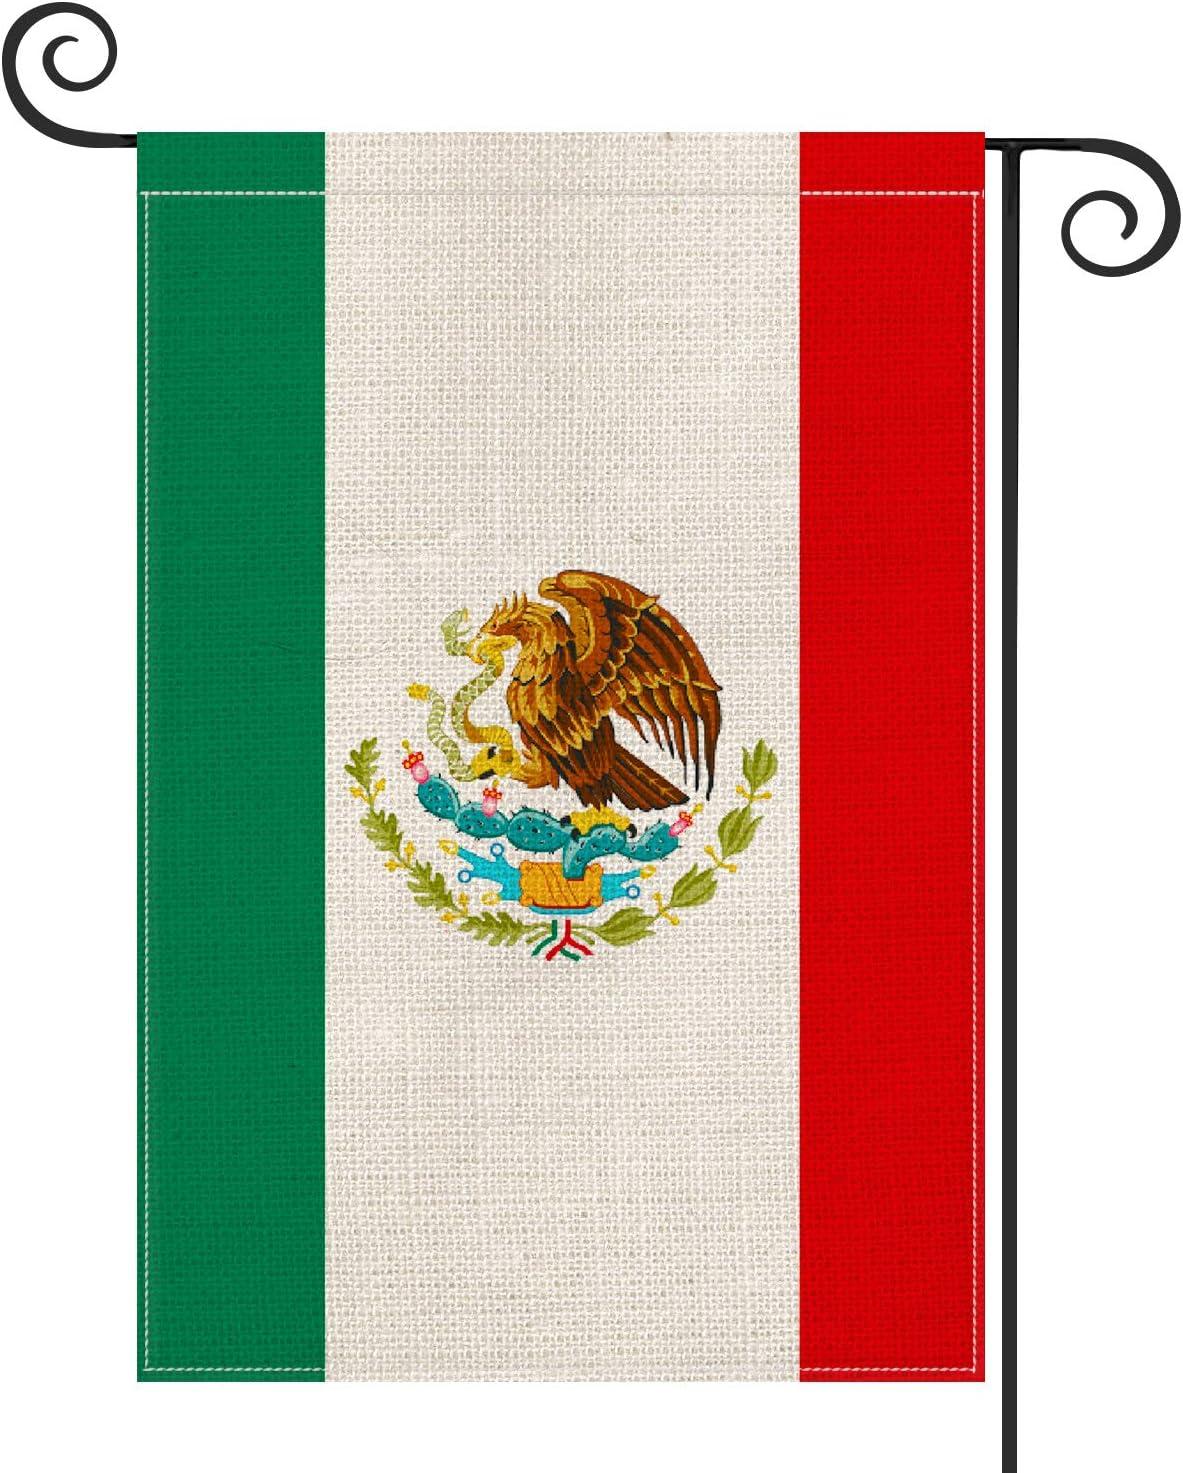 AVOIN Mexican MX National Garden Flag Vertical Double Sized, Día de independecia Yard Outdoor Decoration 12.5 x 18 Inch